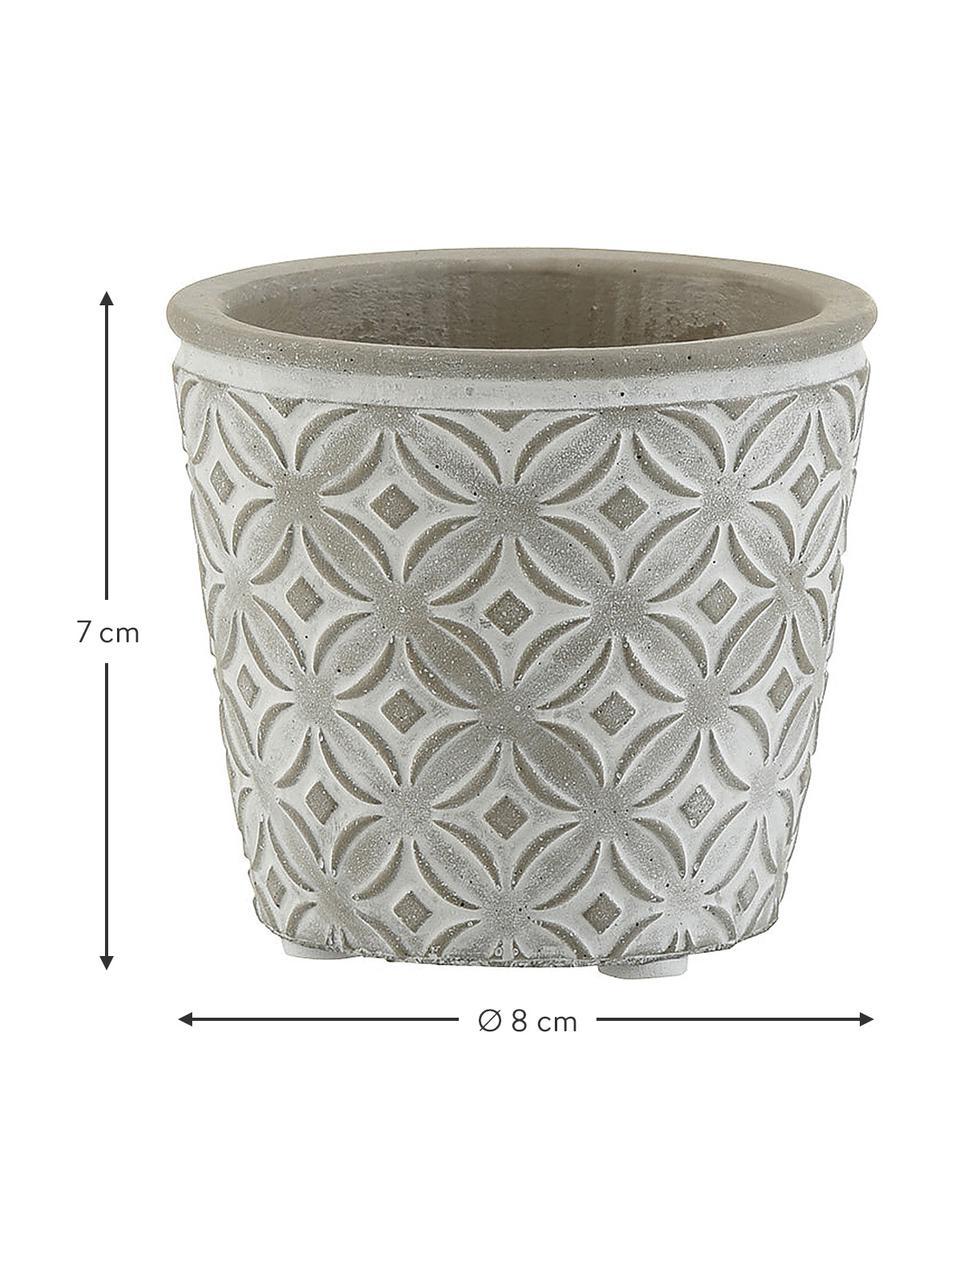 XS plantenpot Oriental, Beton, Betongrijs, Ø 8 x H 7 cm